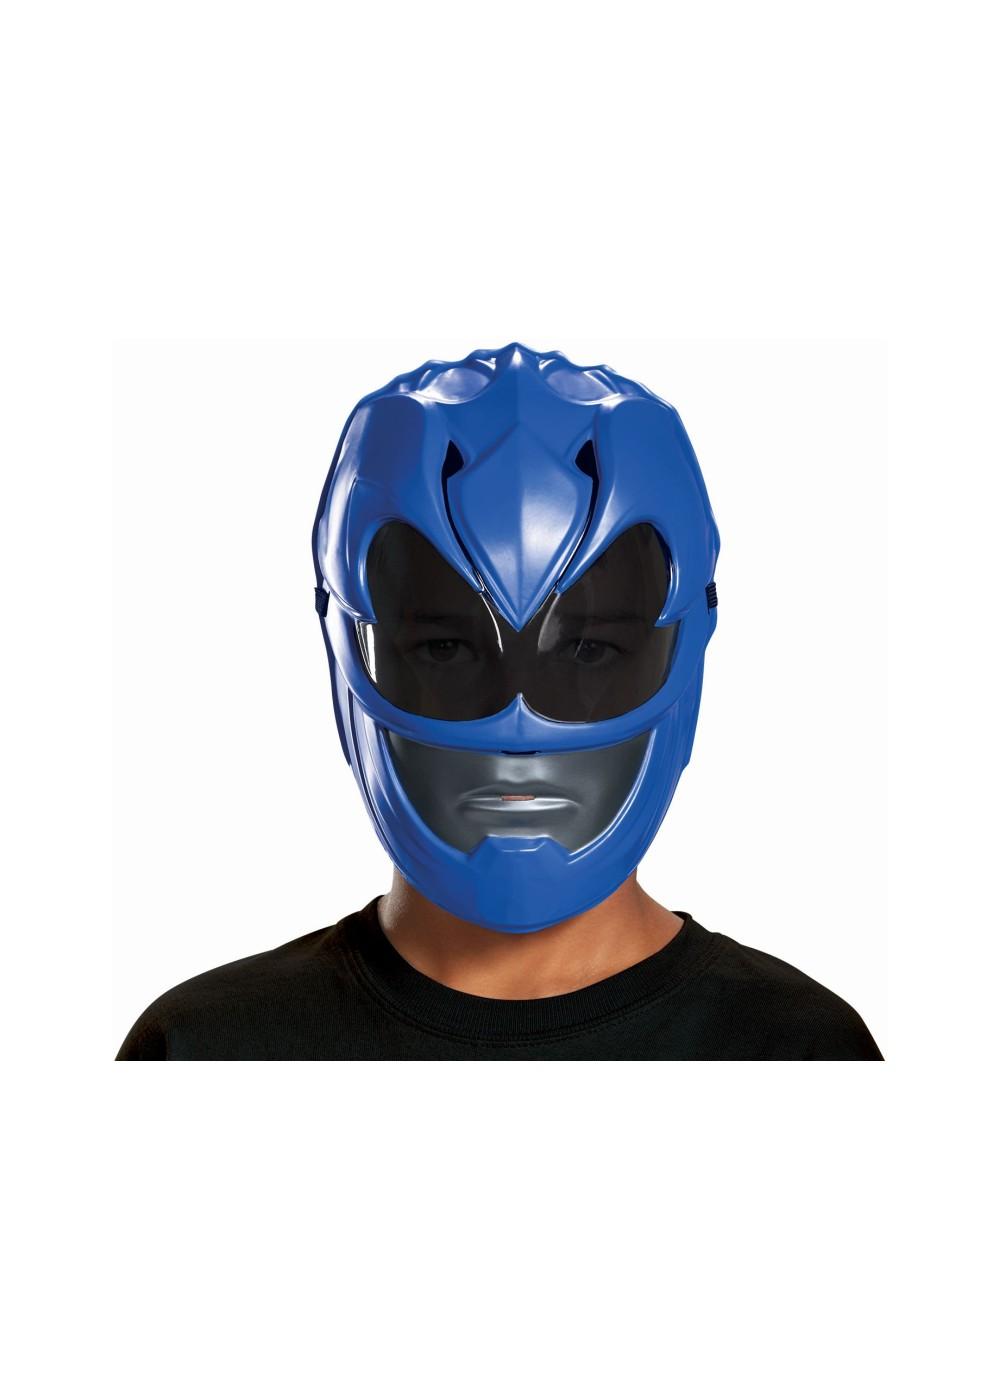 Blue Power Ranger Boys Movie Mask Superhero Costumes